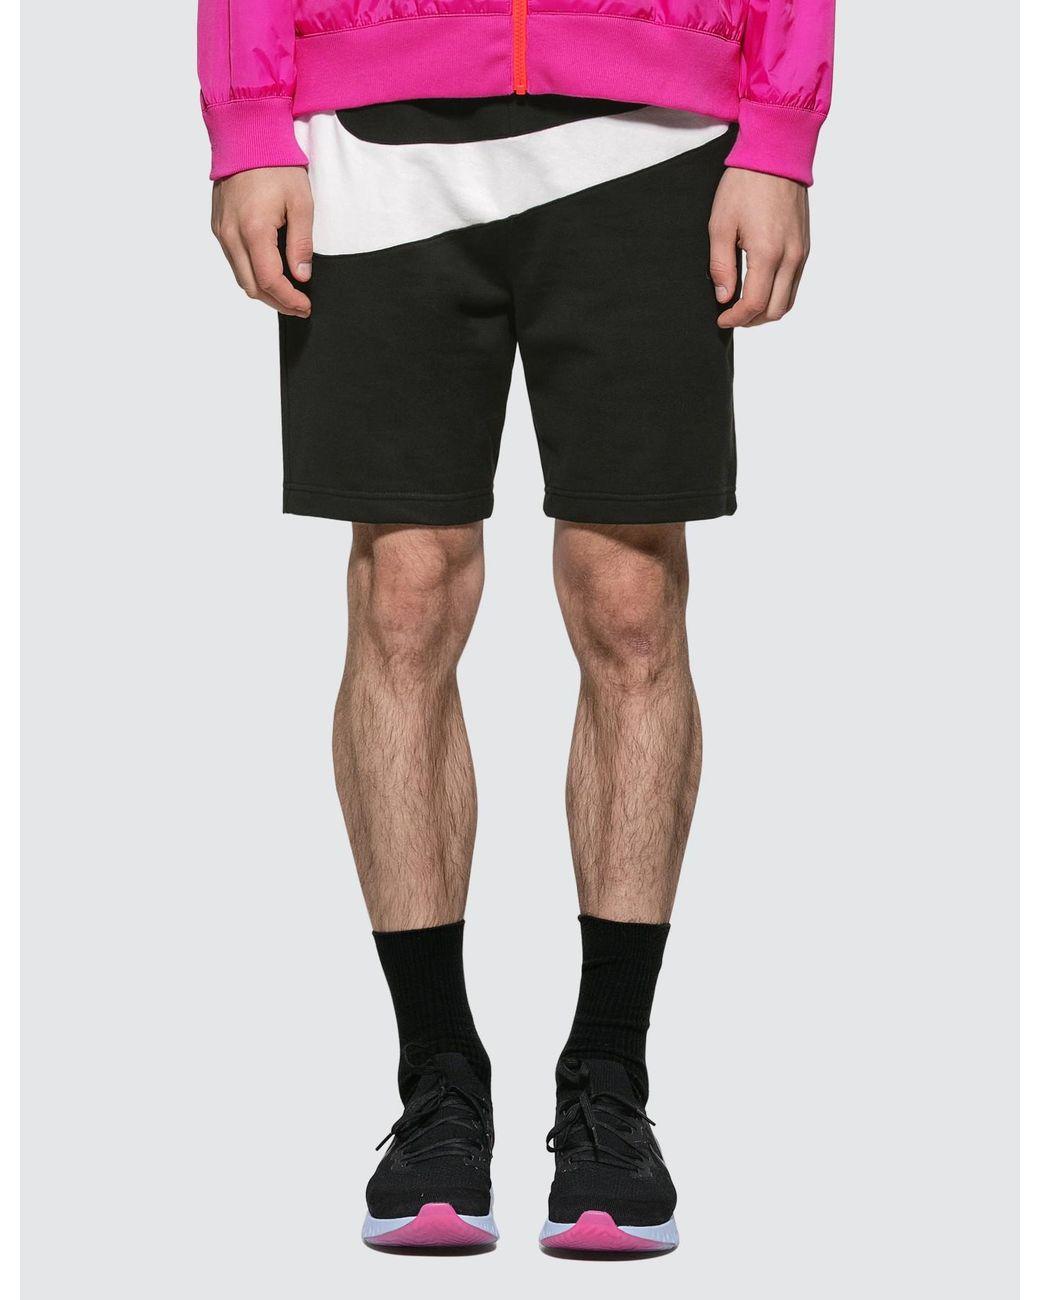 b56ff2bdec7 Lyst - Nike French Terry Men's Shorts in Black for Men